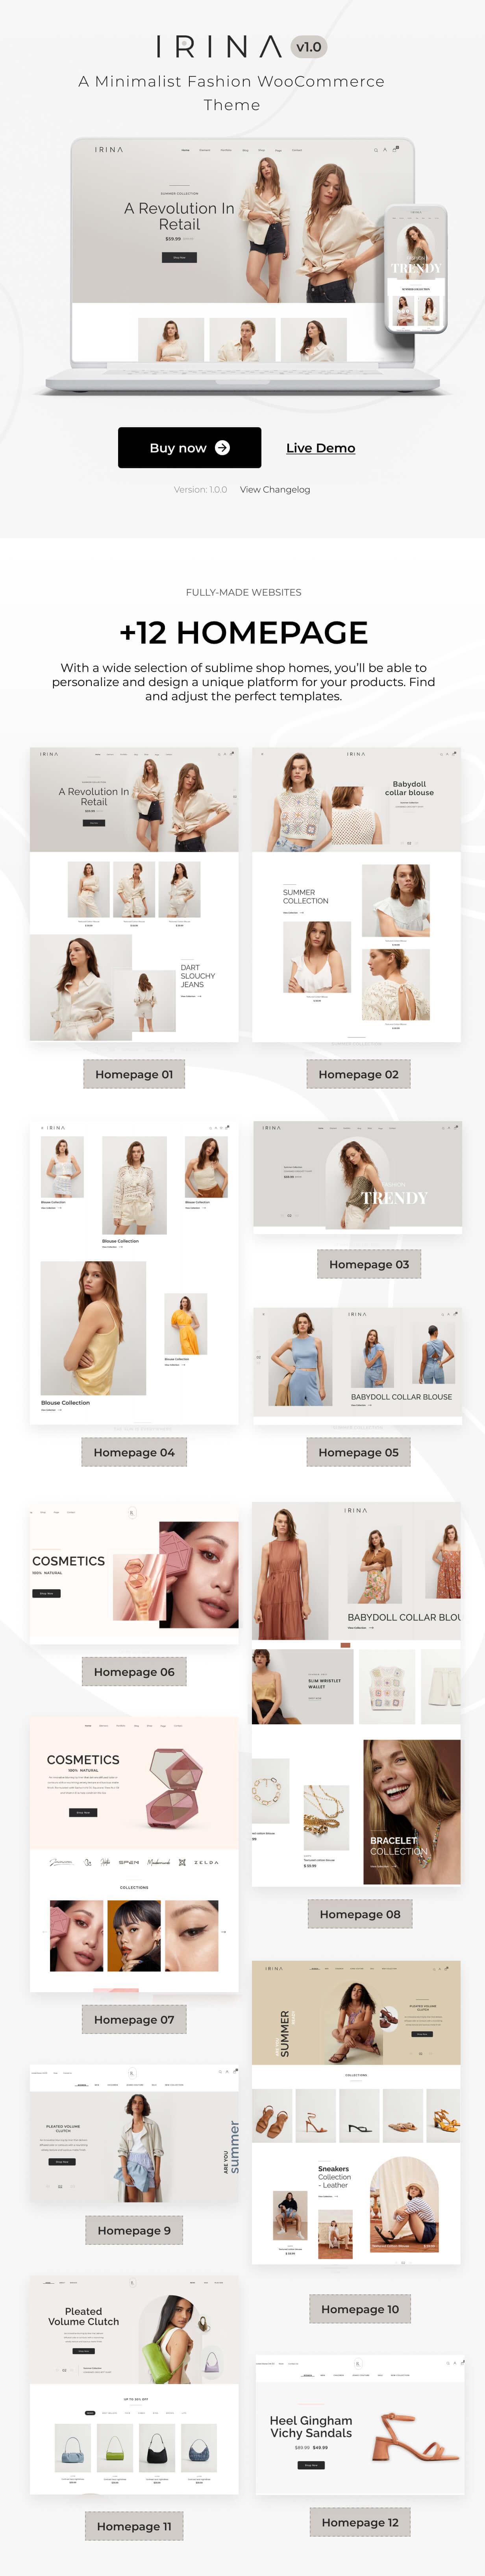 IRINA - Elementor WooCommerce Theme - 1